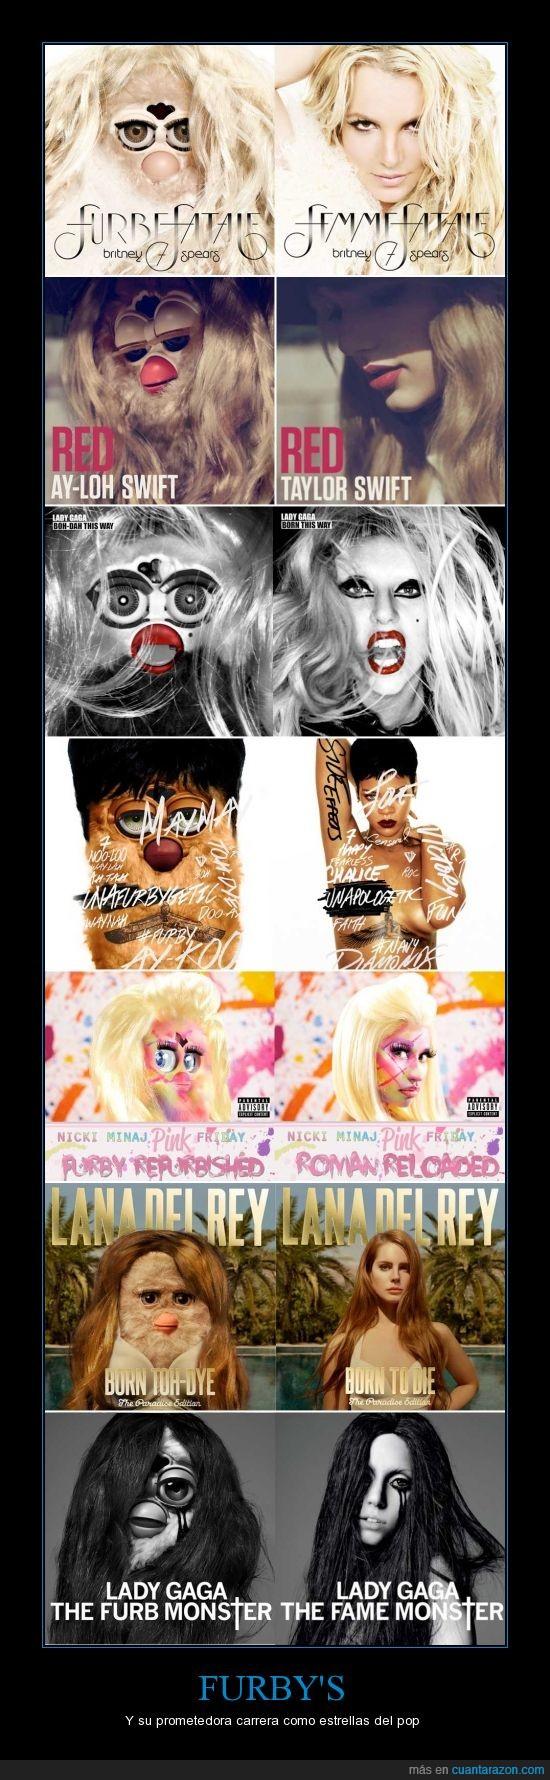 . cd,britney,estrella,furby,lady gaga,lana del rey,pop,portada,single